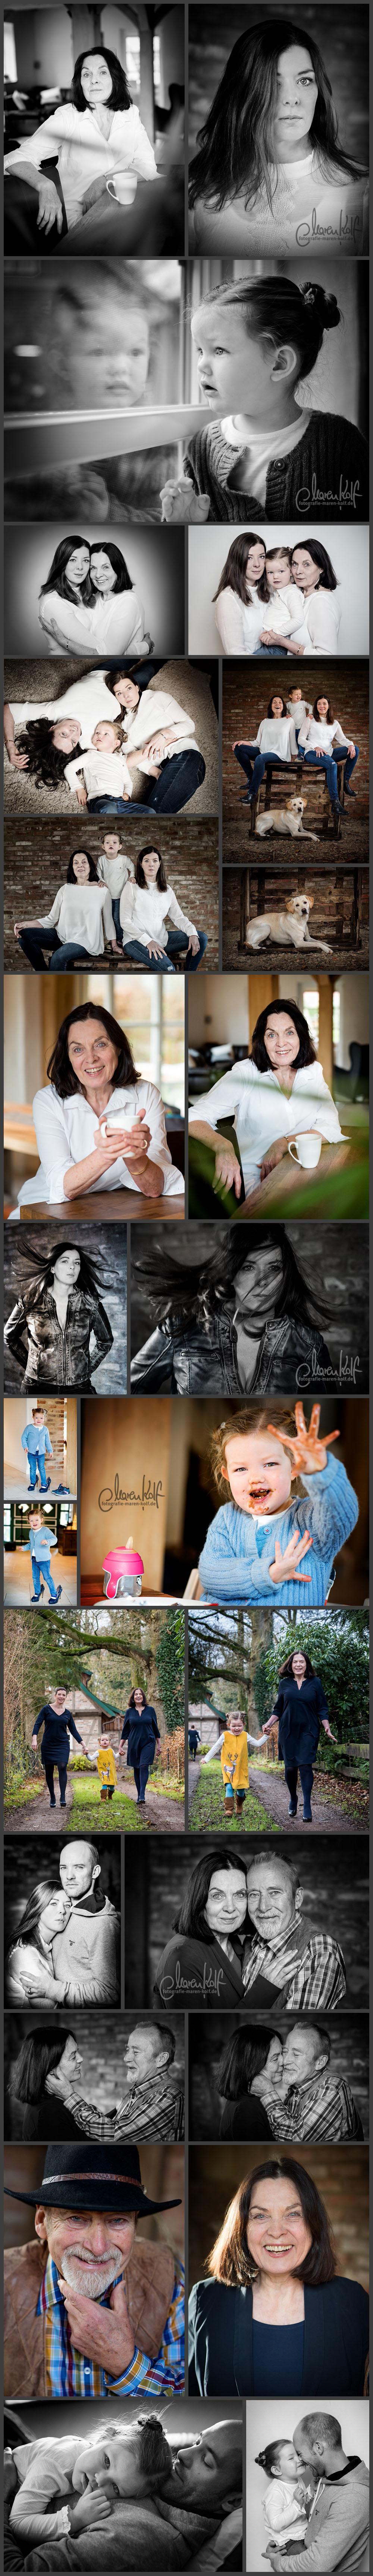 generationenportrait-mutter-tochter-enkelin-fotografie-maren-kolf-wedemark-blog